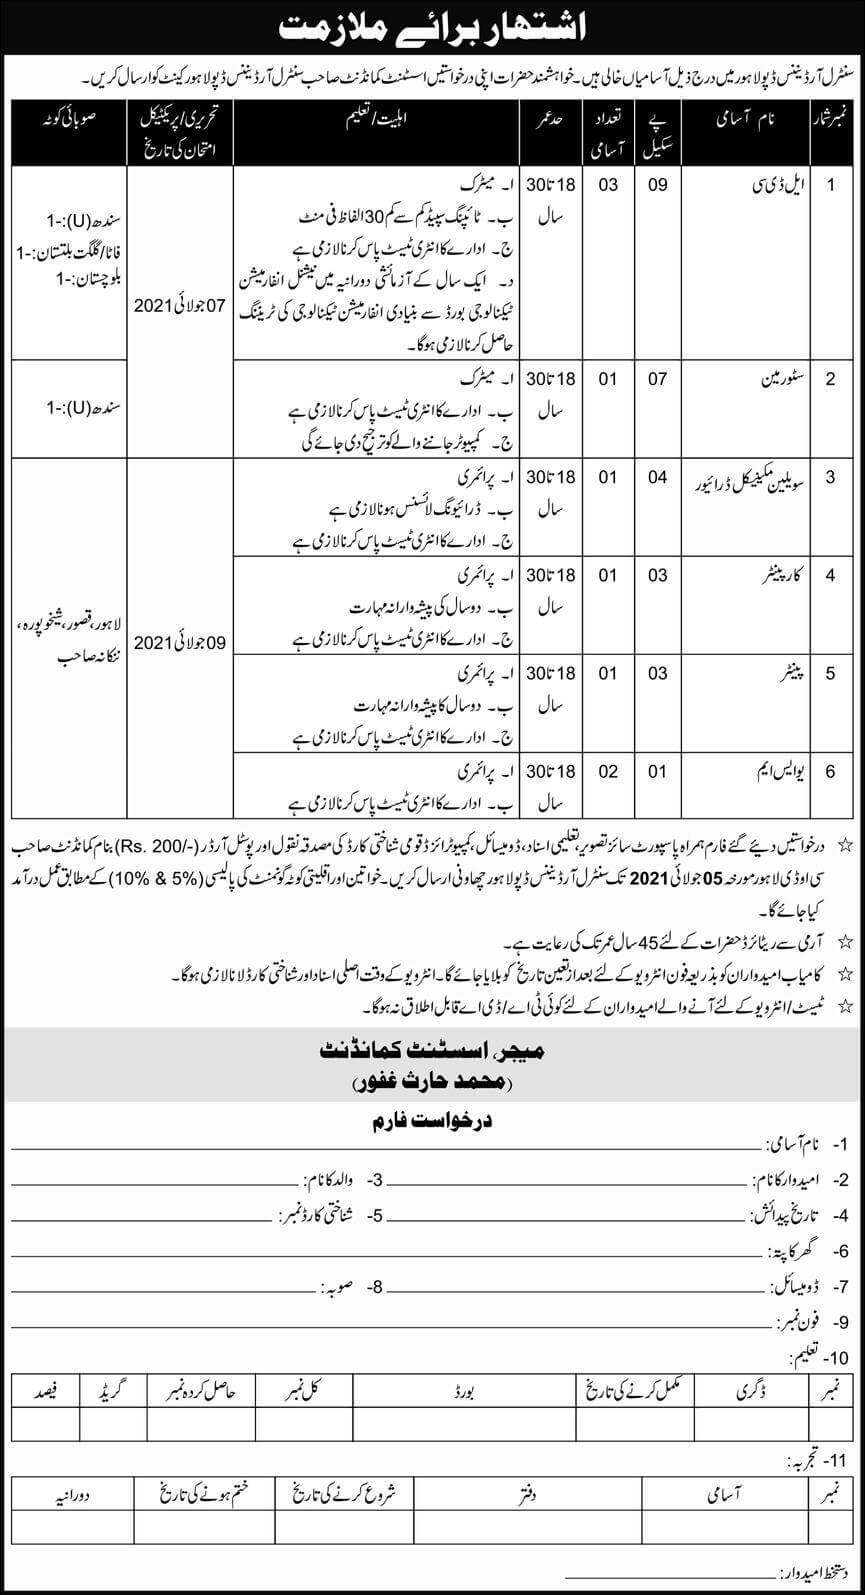 Pak Army Central Ordnance Depot COD Lahore Jobs June 2021